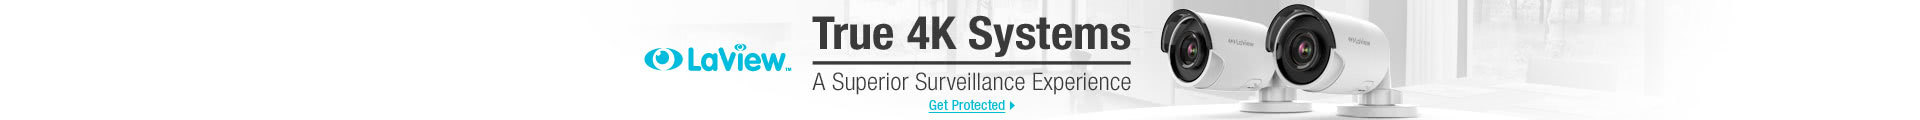 True 4k Systems